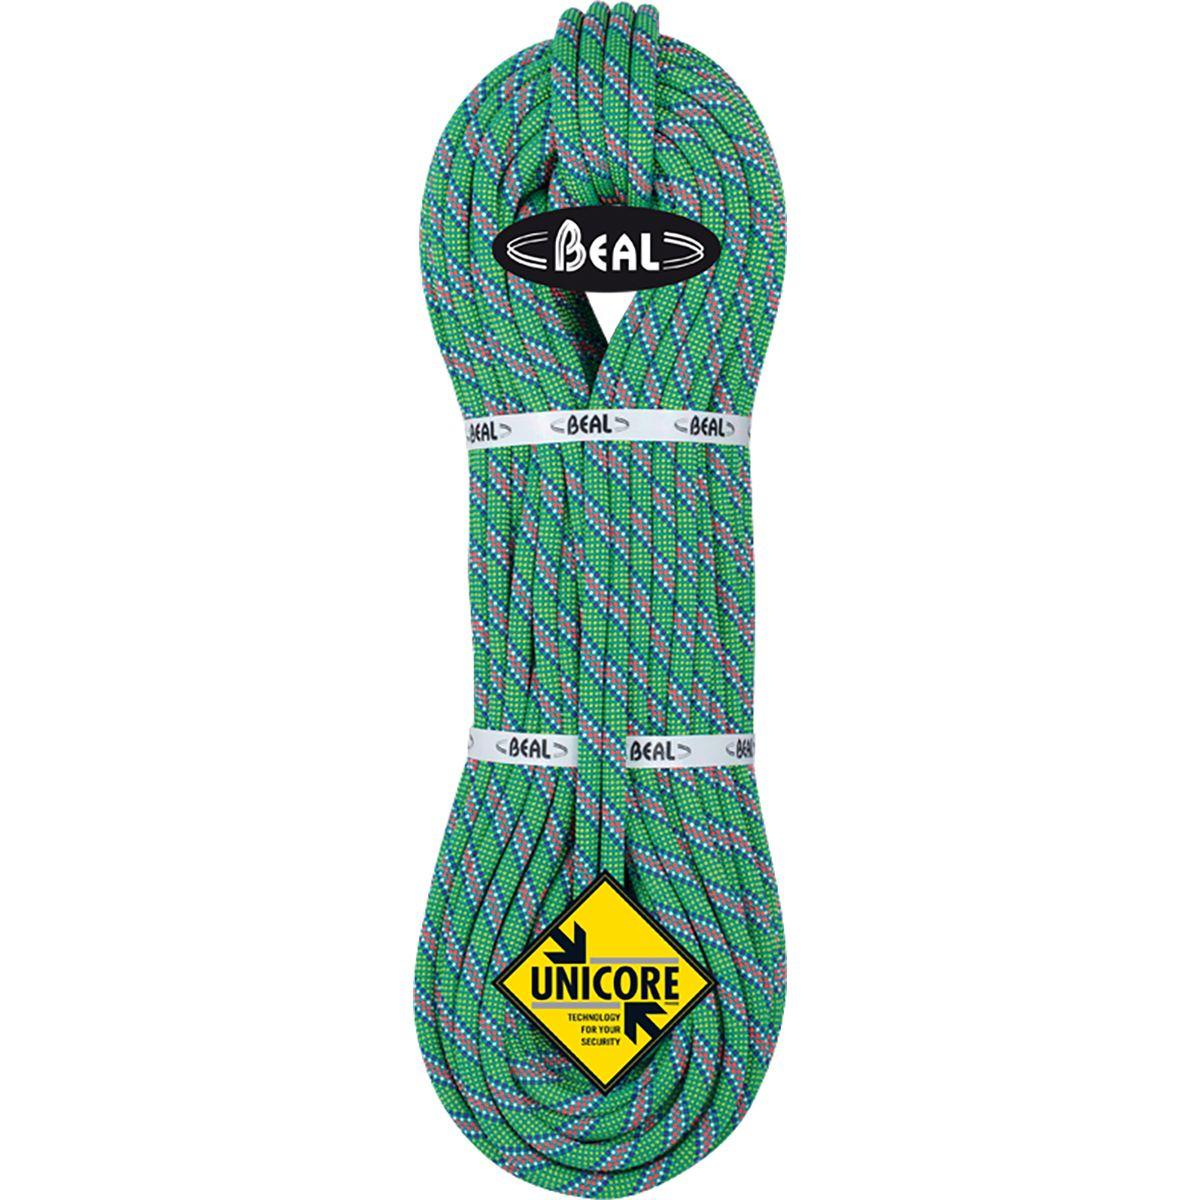 Beal Top Gun II Unicore Dry Cover Climbing Rope - 10.5mm Green, 60m